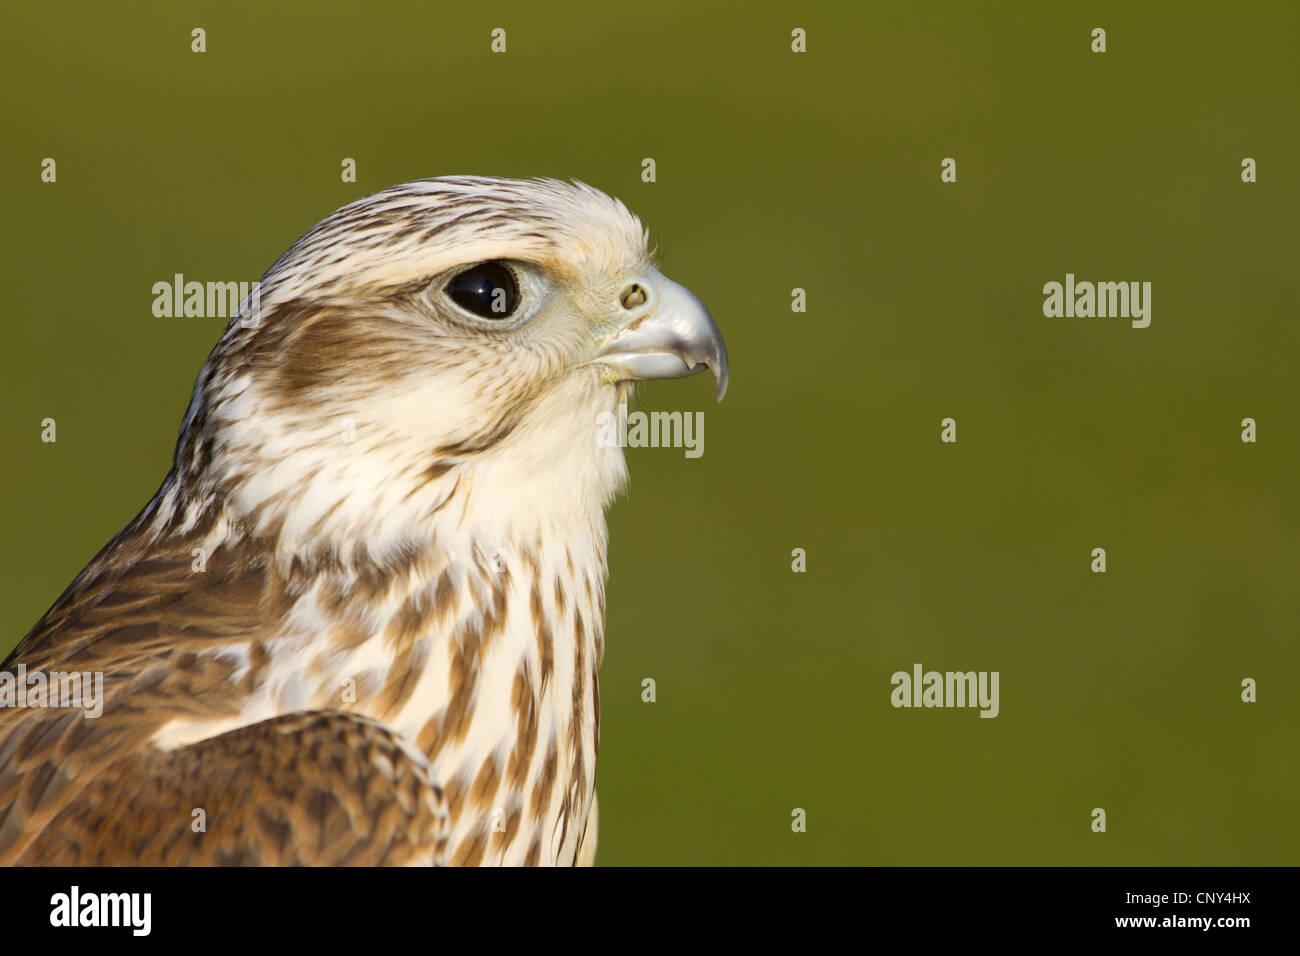 Saker falcon (Falco cherrug), portrait - Stock Image